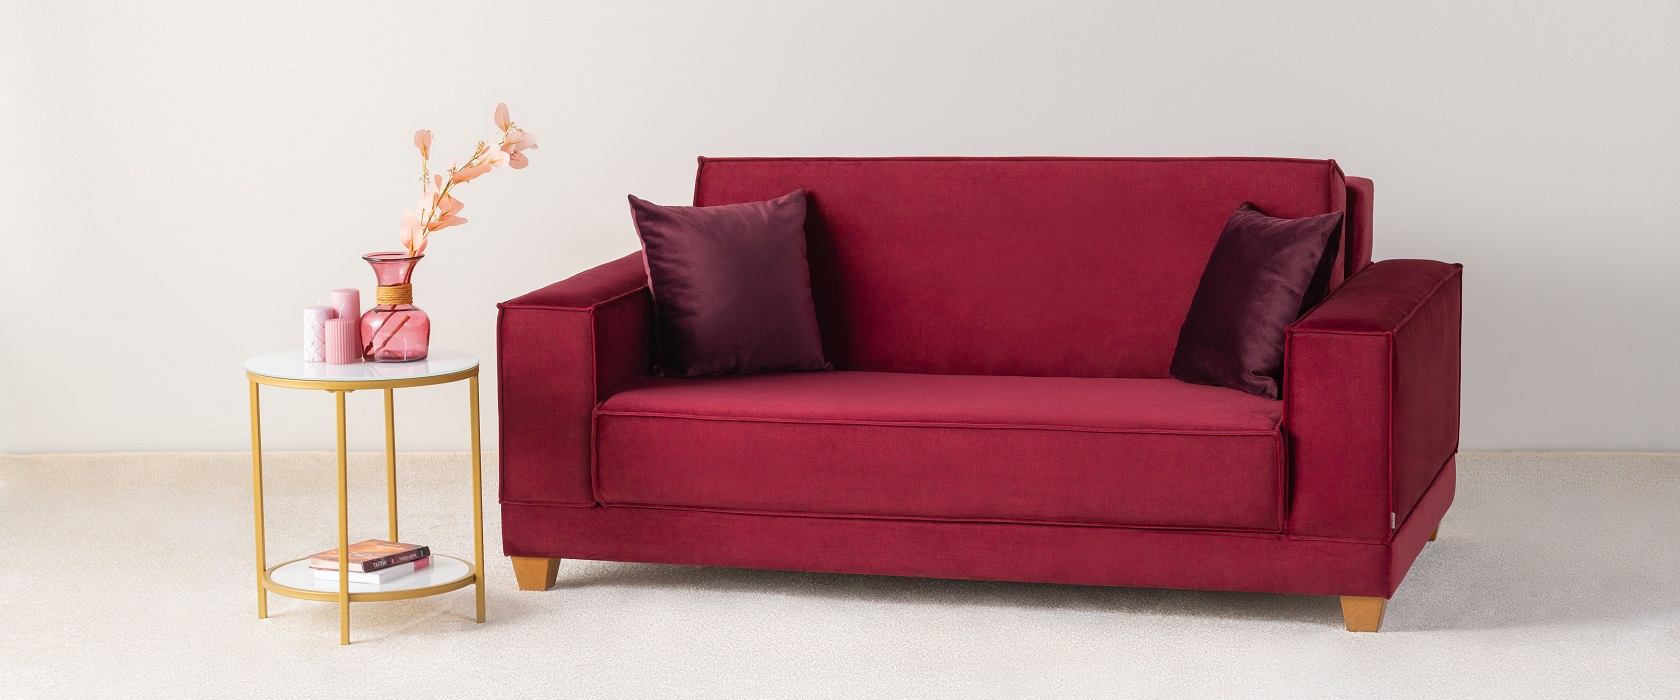 Двомісний диван Cosima - Фото 2 - Pufetto